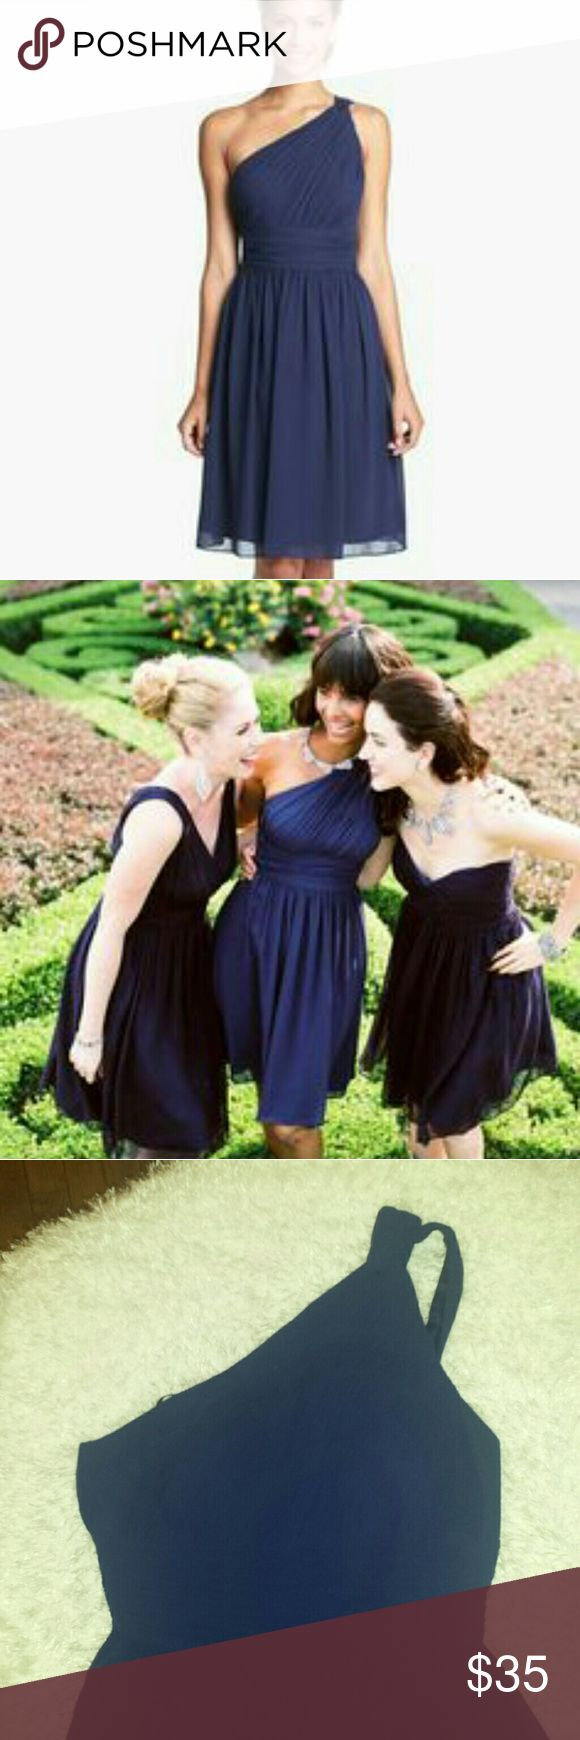 DONNA MORGAN NAVY BLUE CROSS BODY DRESS Donna morgan one shoulder dress..any questions please ask. ....price is firm....12 Donna Morgan Dresses One Shoulder